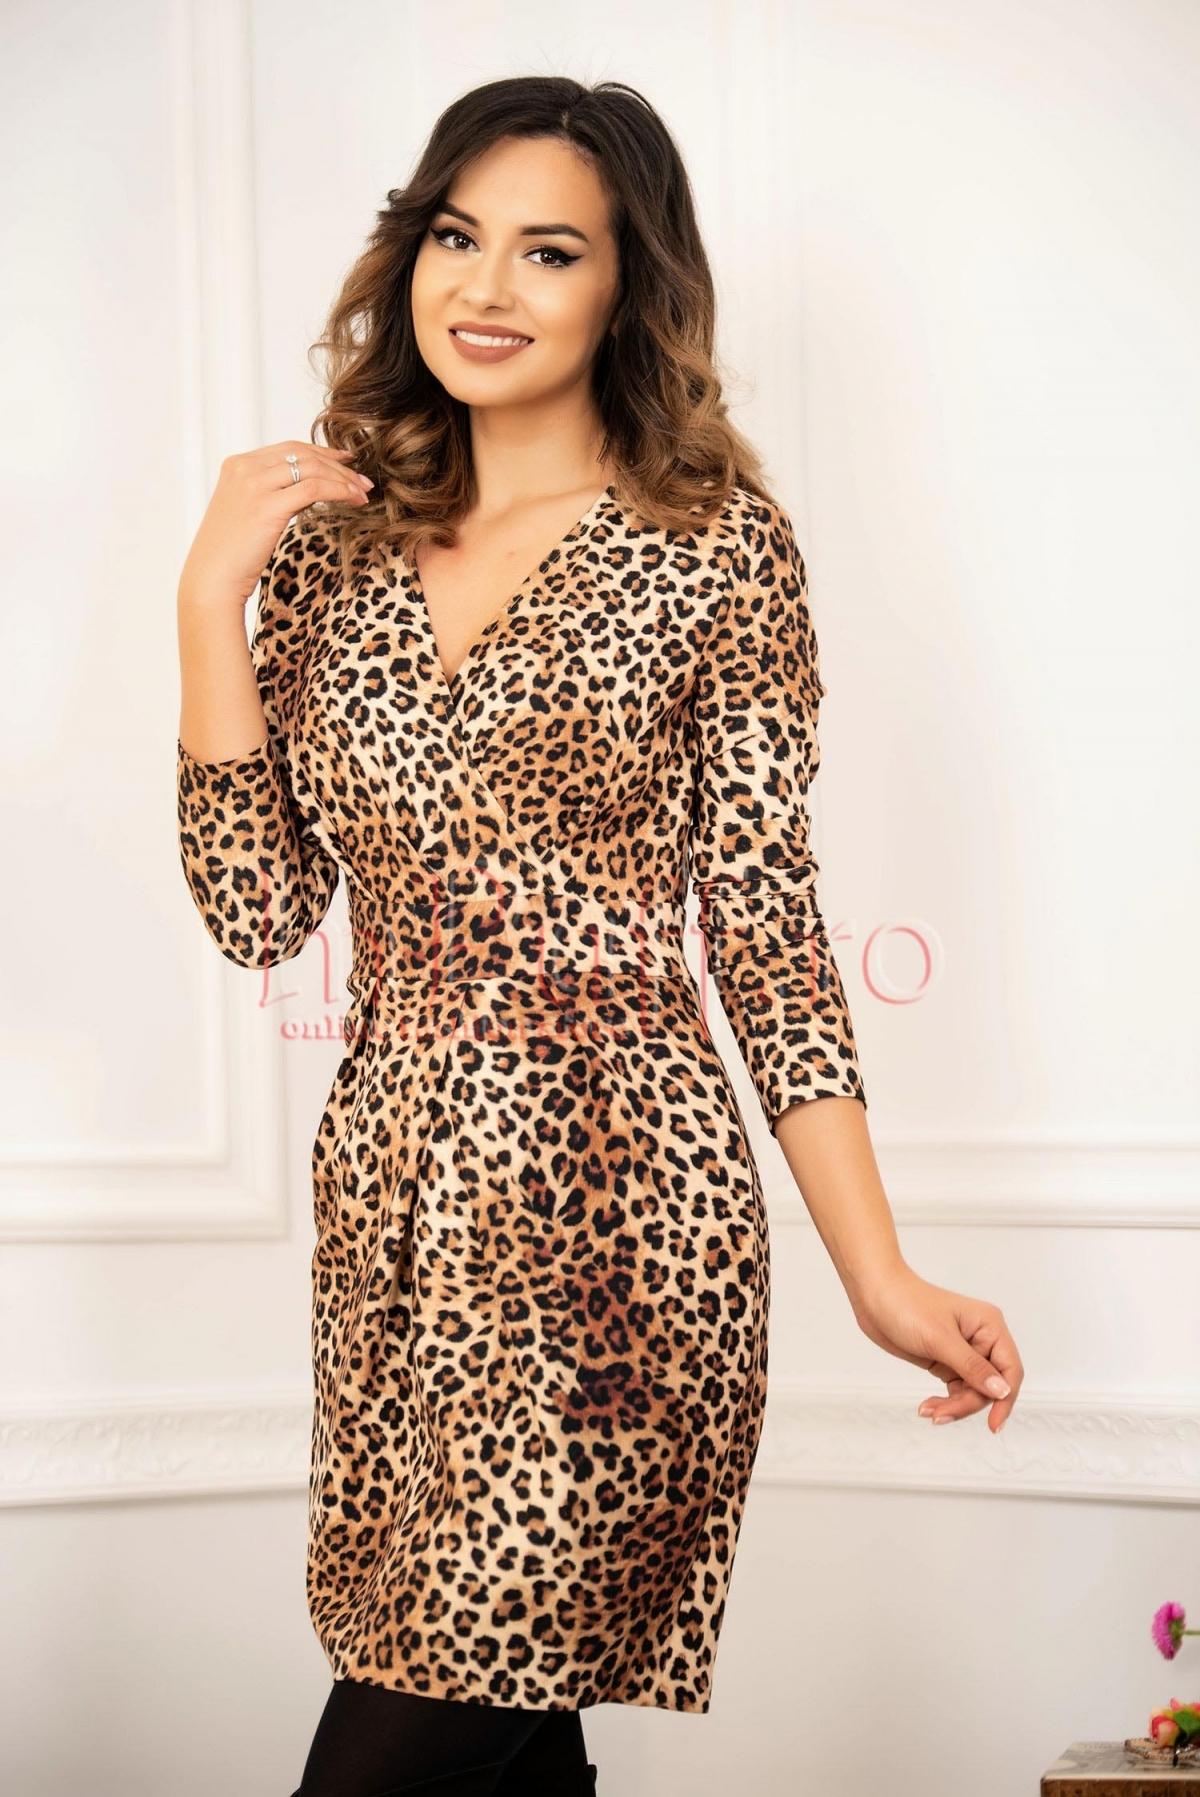 Rochie eleganta animal print din stofa cu decolteu petrecut